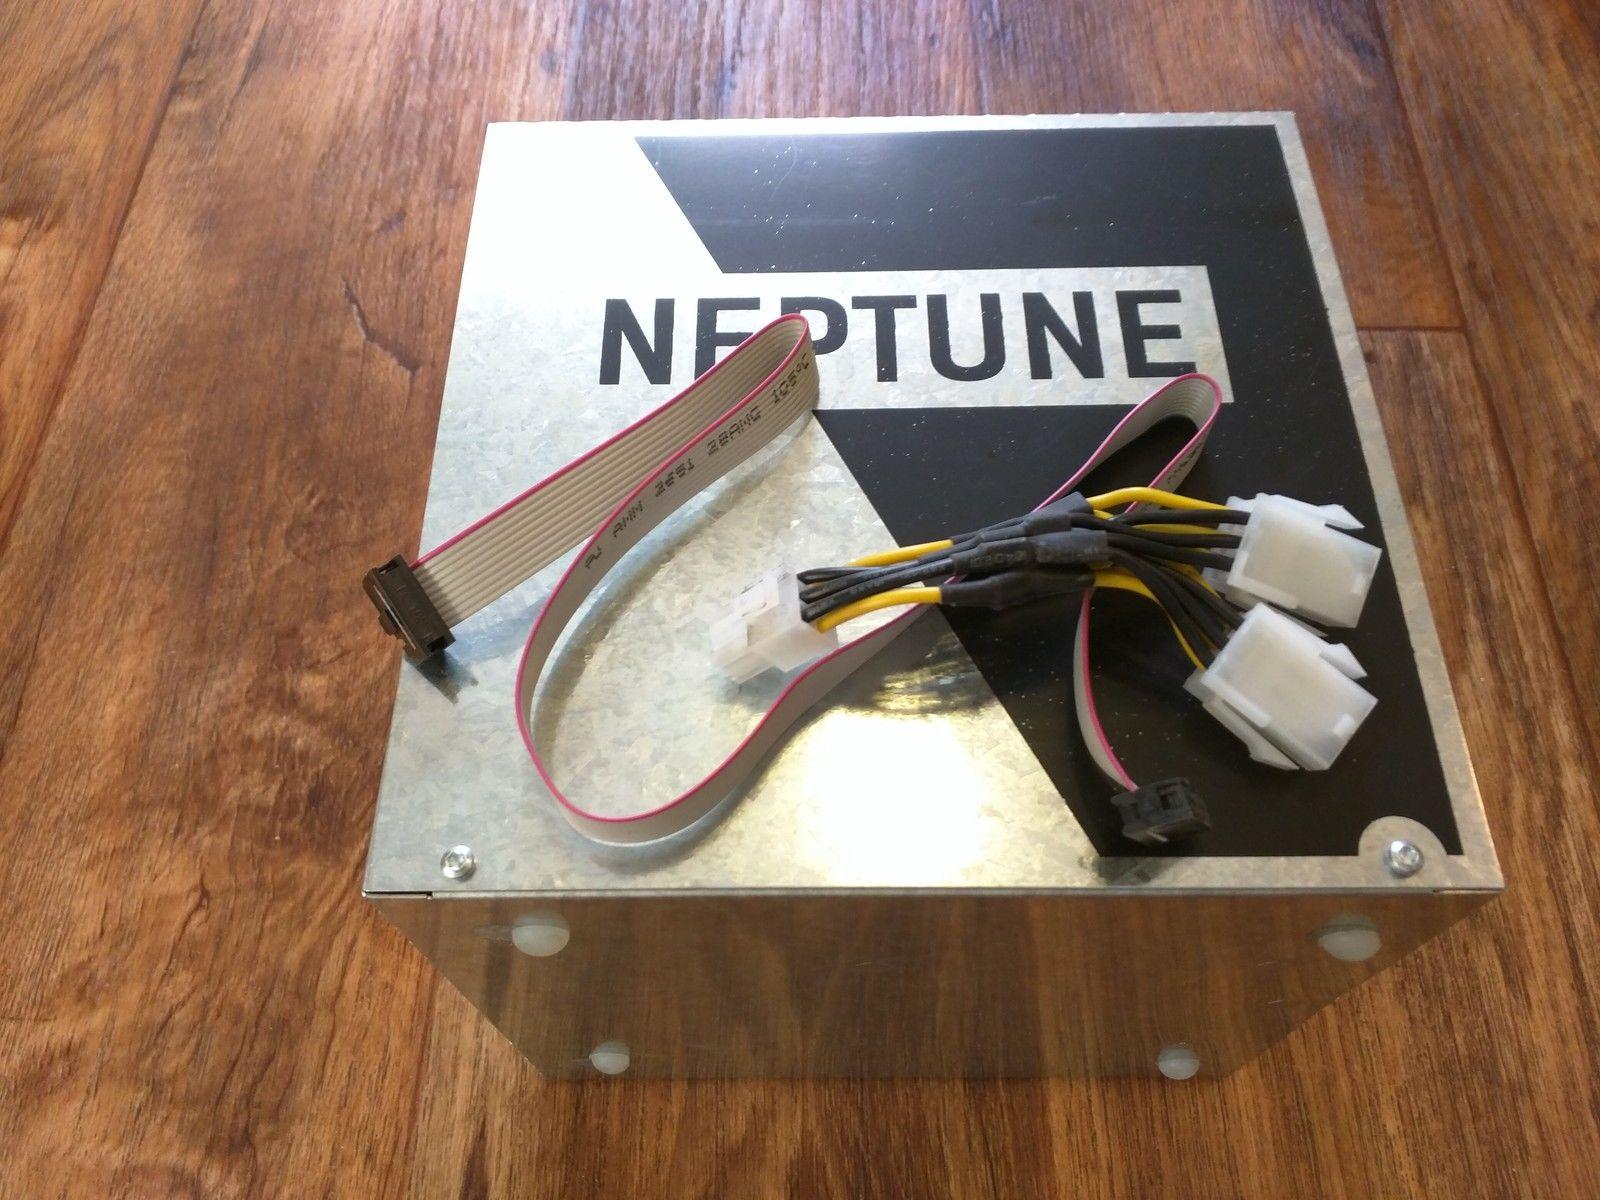 knc-Neptune